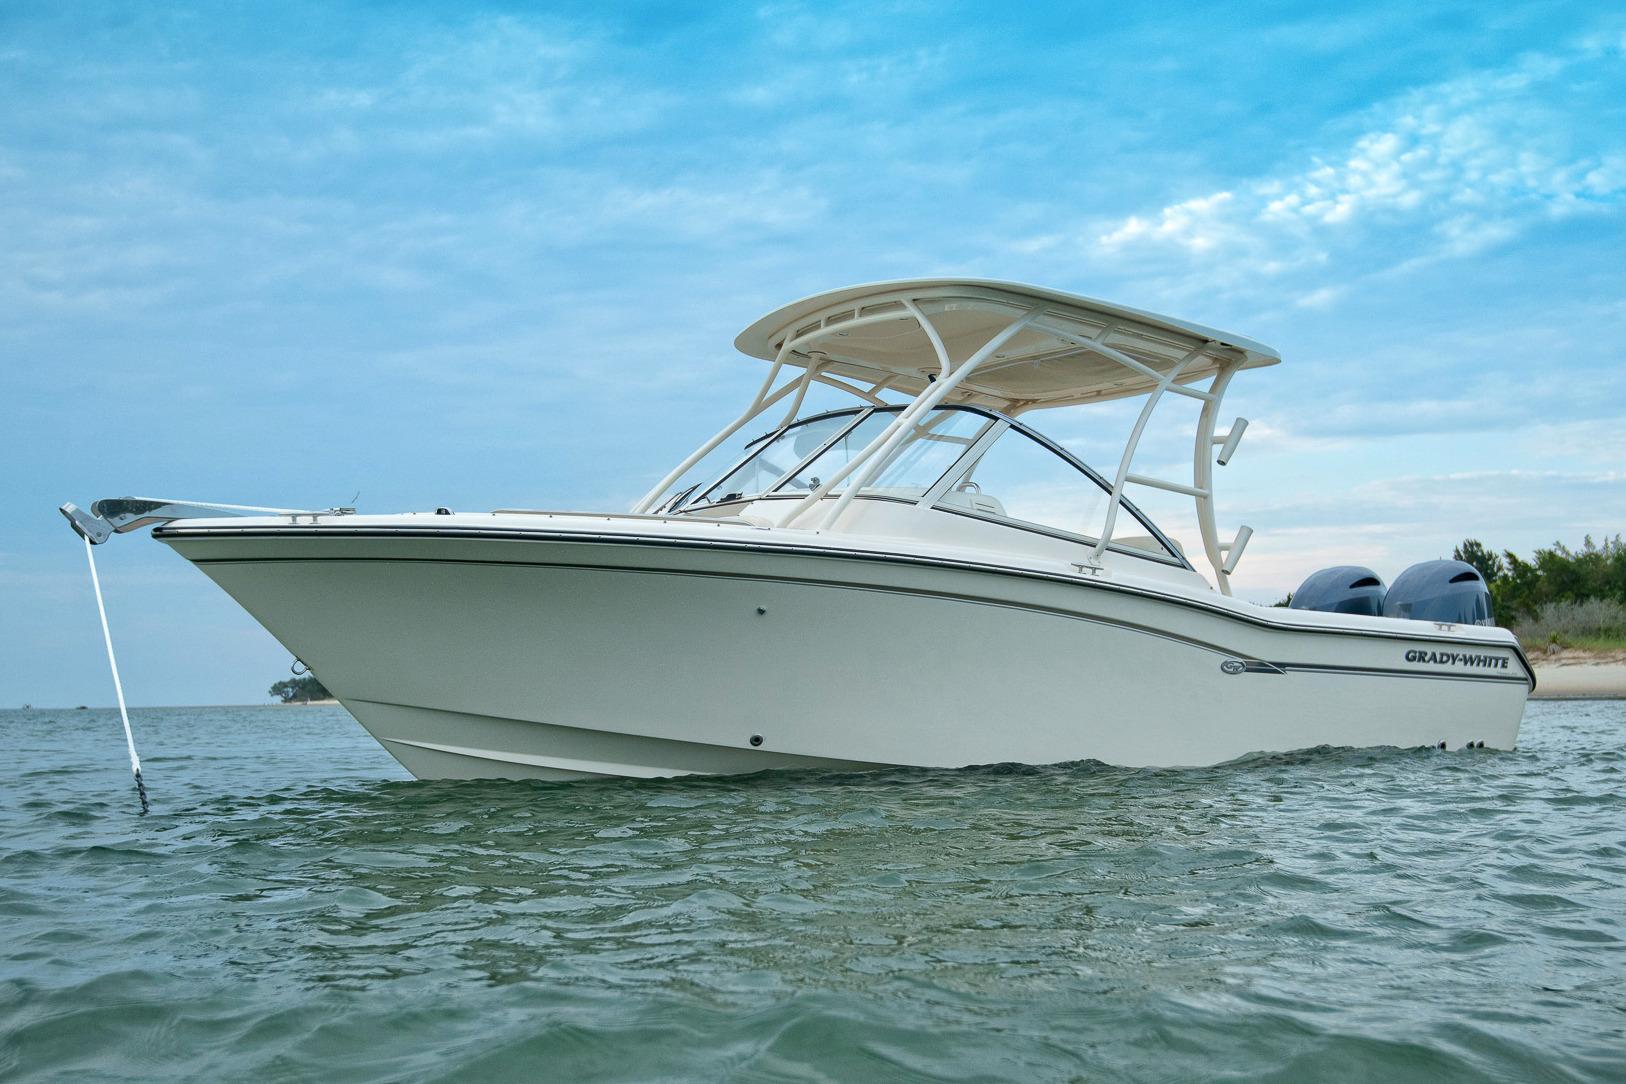 2018 grady white freedom 255 power boat for sale www yachtworld com rh yachtworld com 90 Johnson Ignition Wiring Diagram Boat Wiring Diagrams Schematics